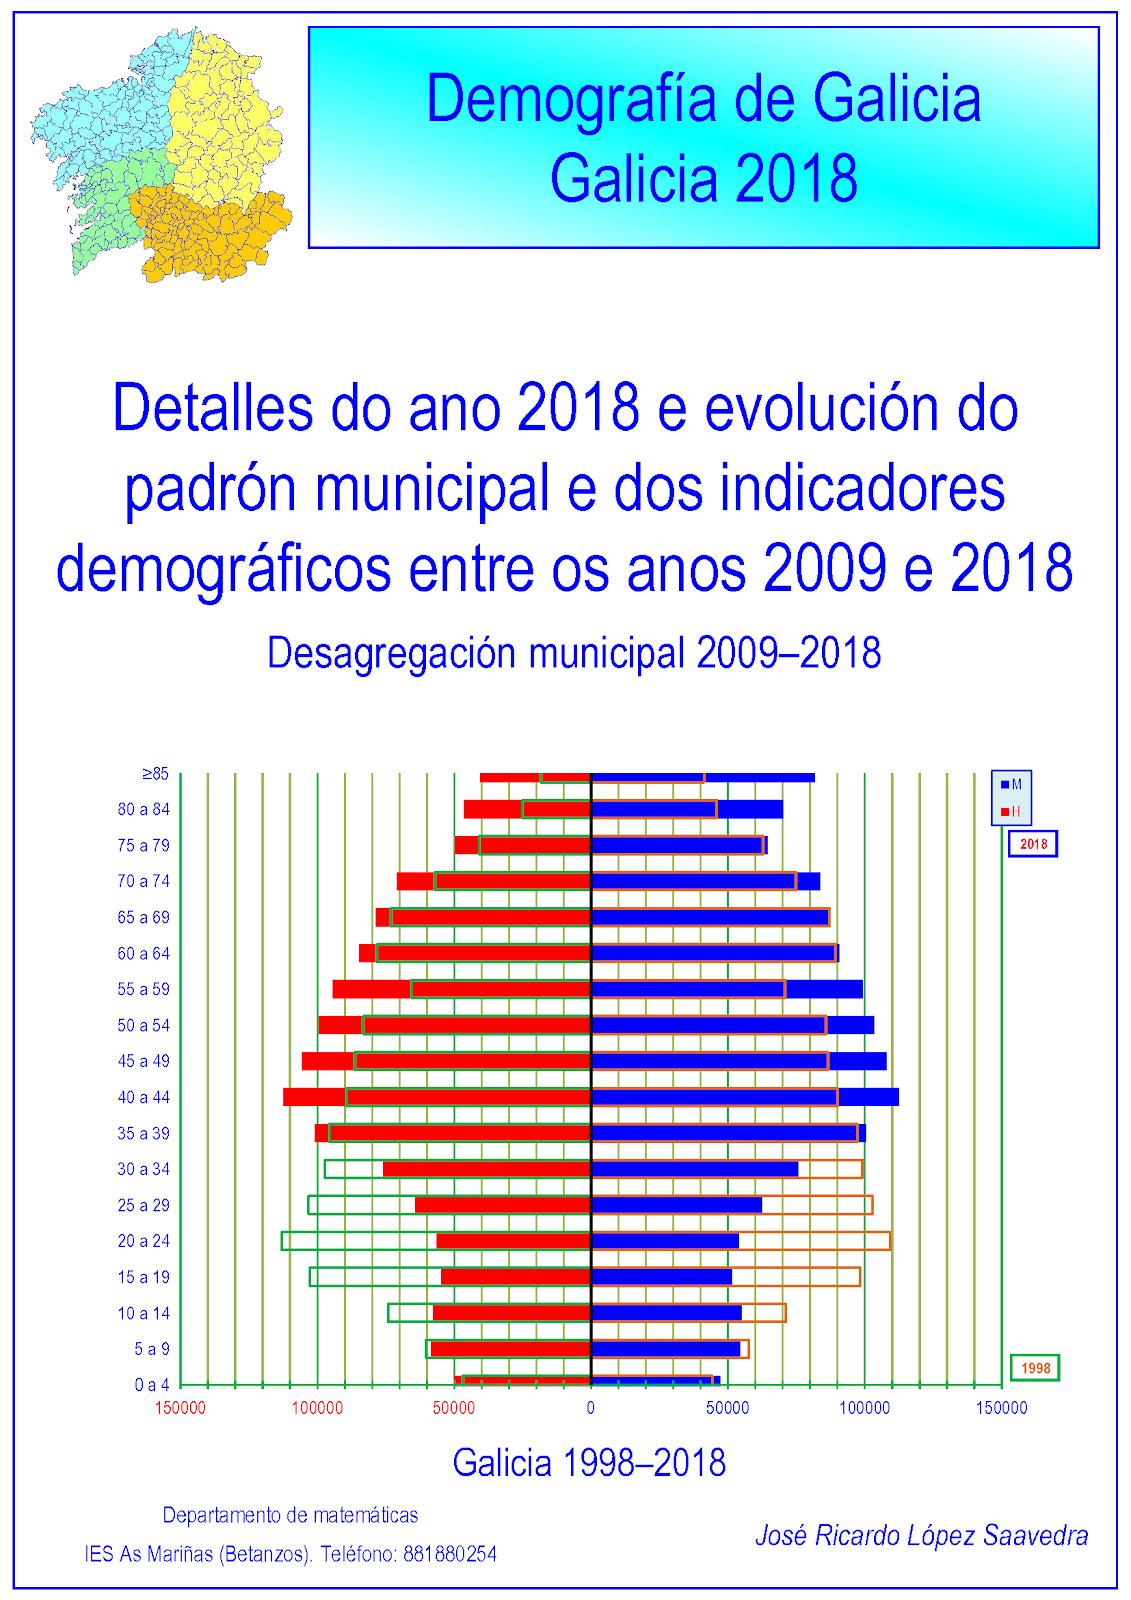 Galicia 2018